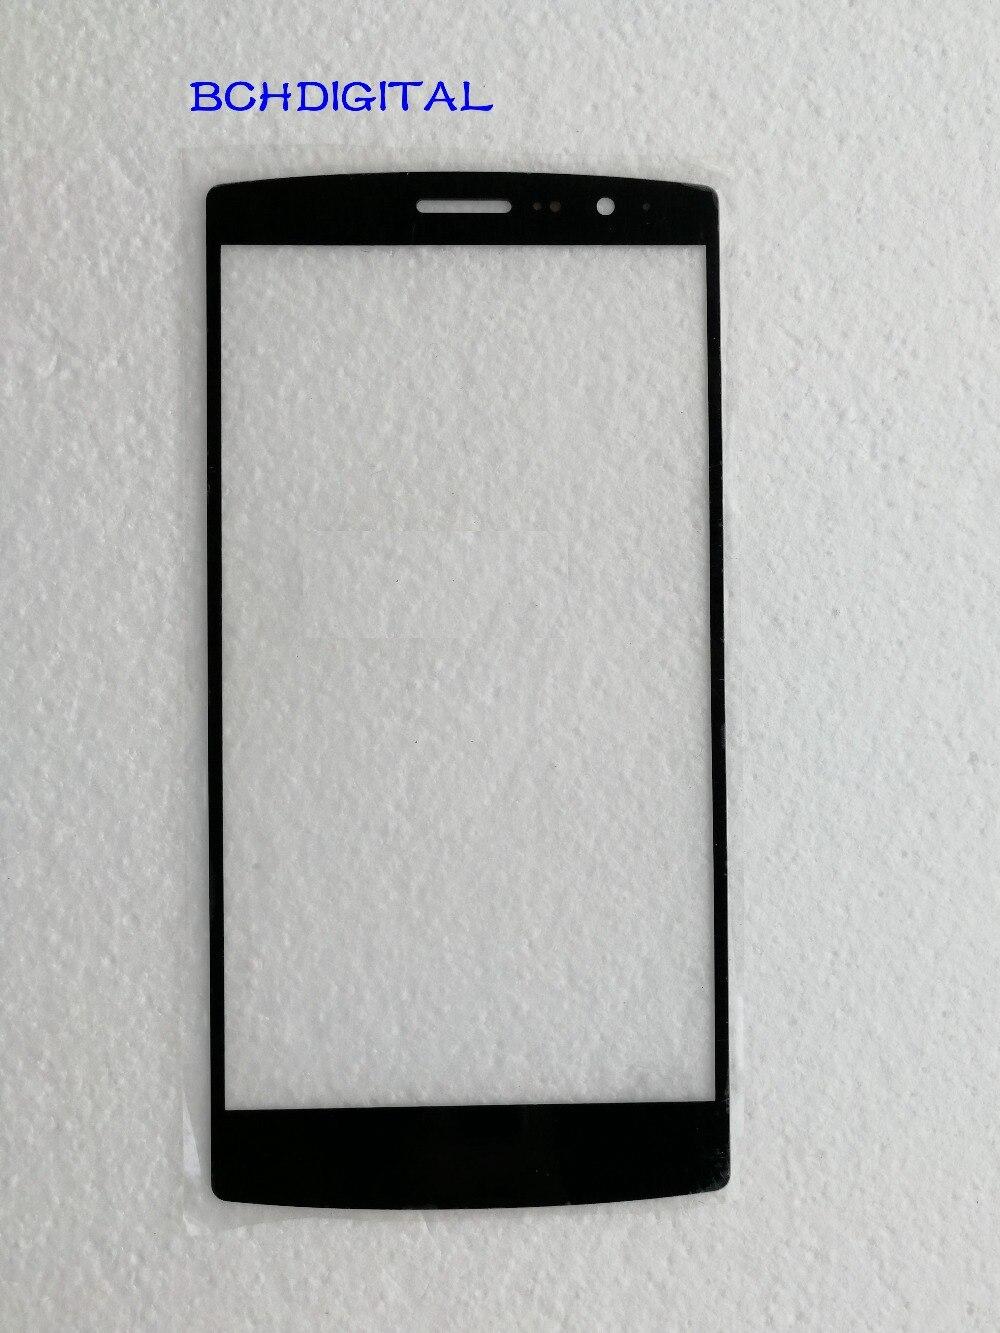 BCHDIGITAL LG041 para LG G4/G4 Stylus/G4 mini pantalla táctil LCD cubierta exterior de vidrio frontal de reemplazo del panel de la lente